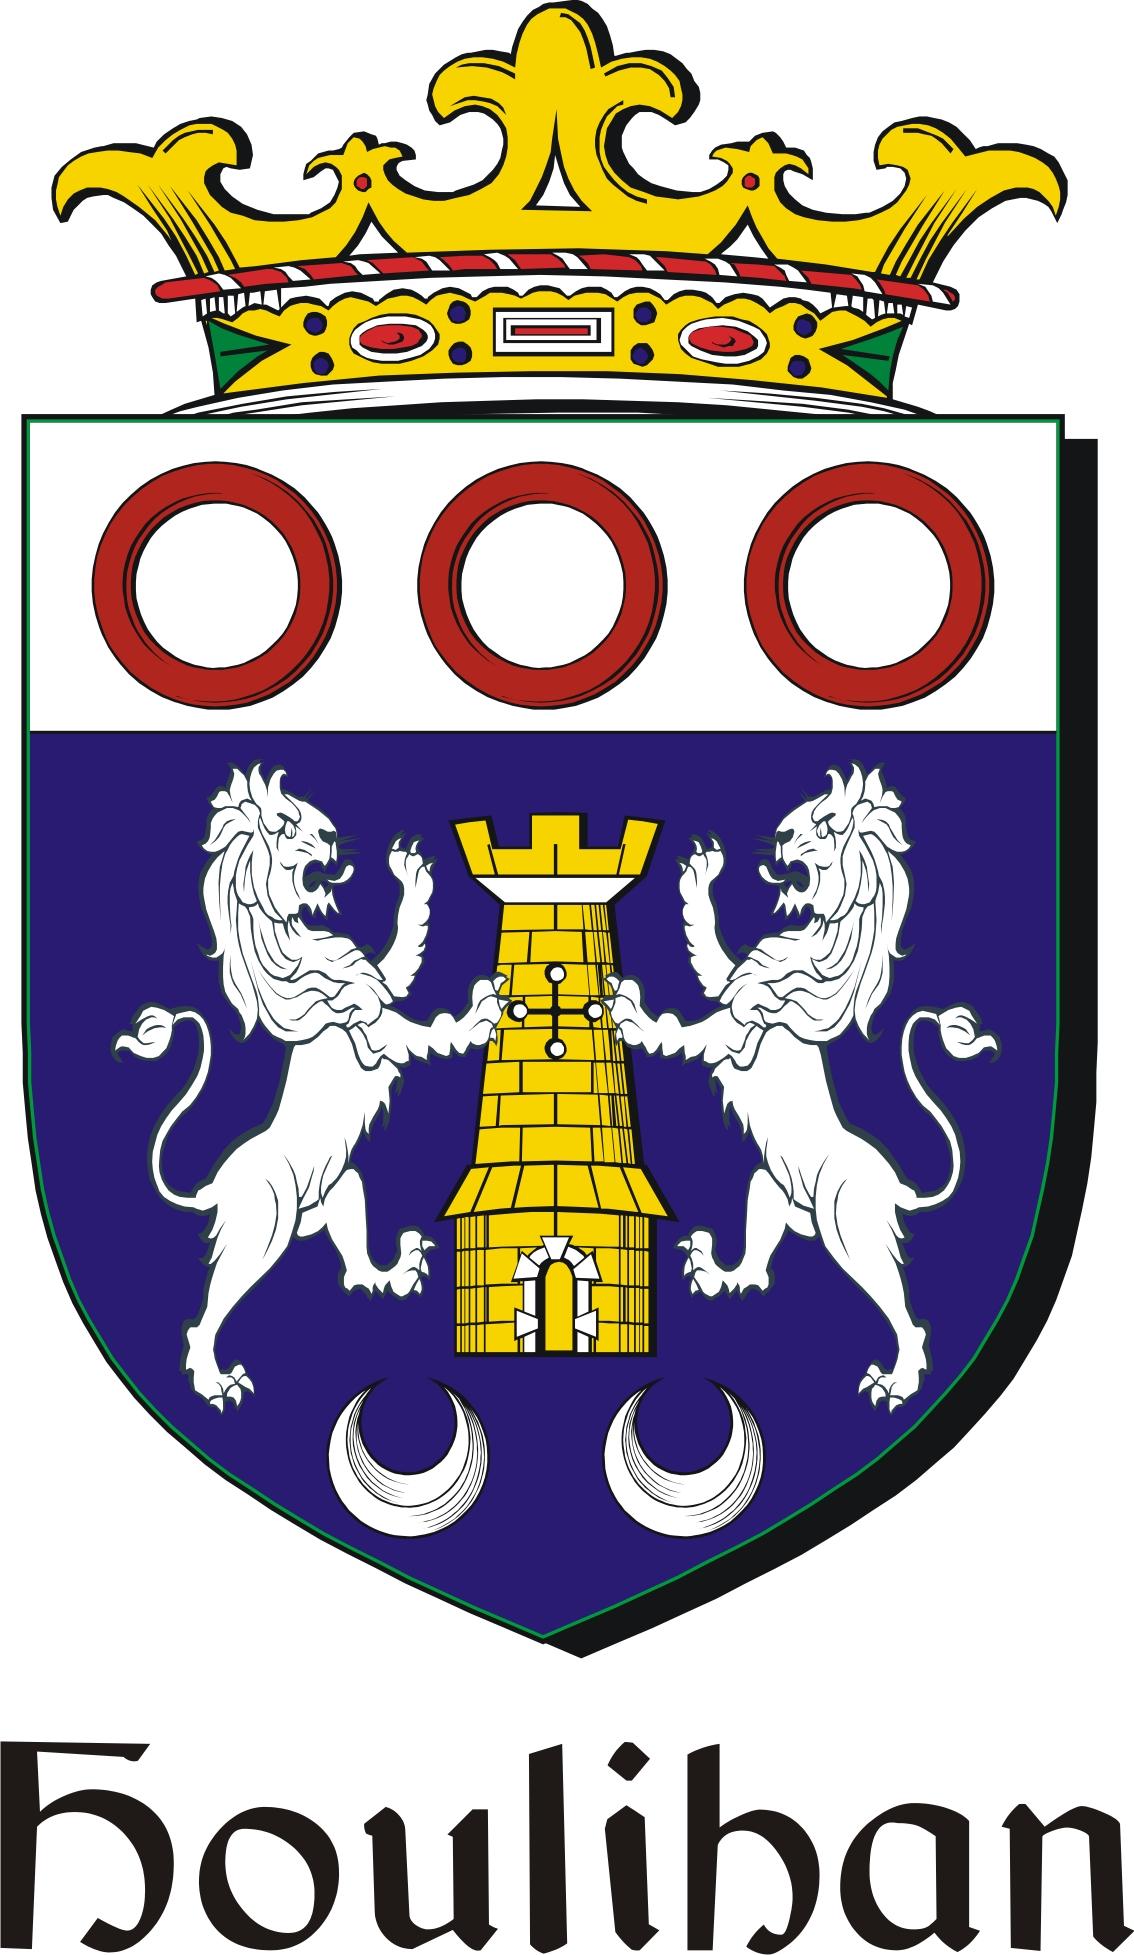 Houlihan family crest irish coat of arms image download houlihan houlihan family crest irish coat of arms image download buycottarizona Images